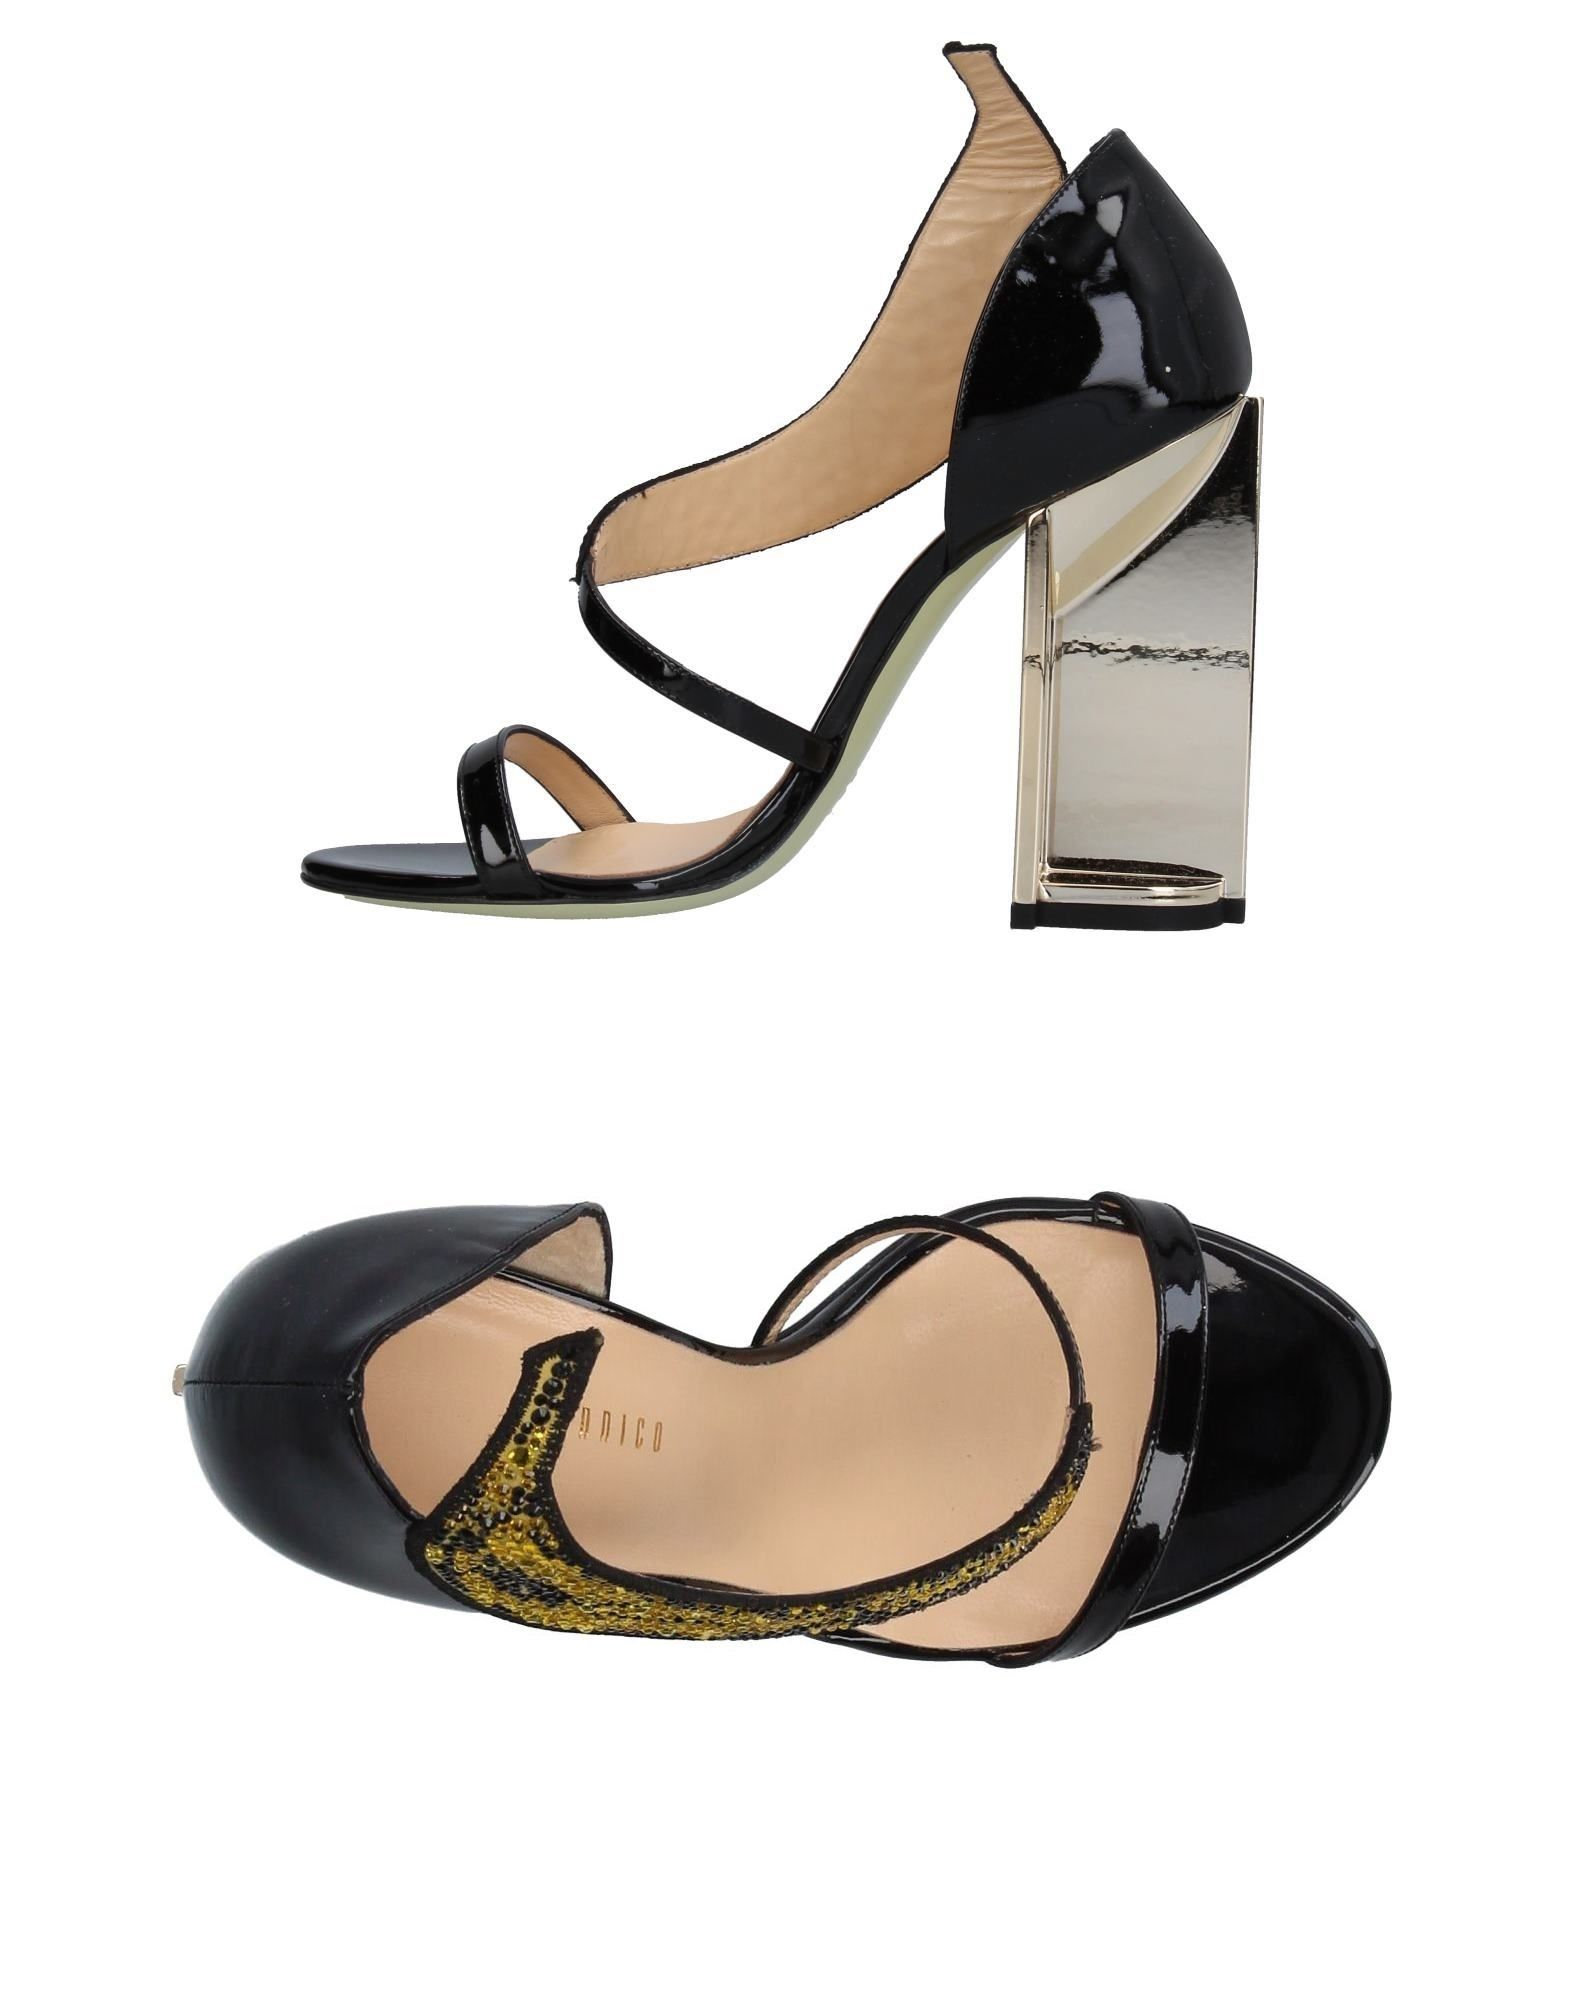 Giannico Sandalen Damen  11377524KR Gute Qualität beliebte Schuhe